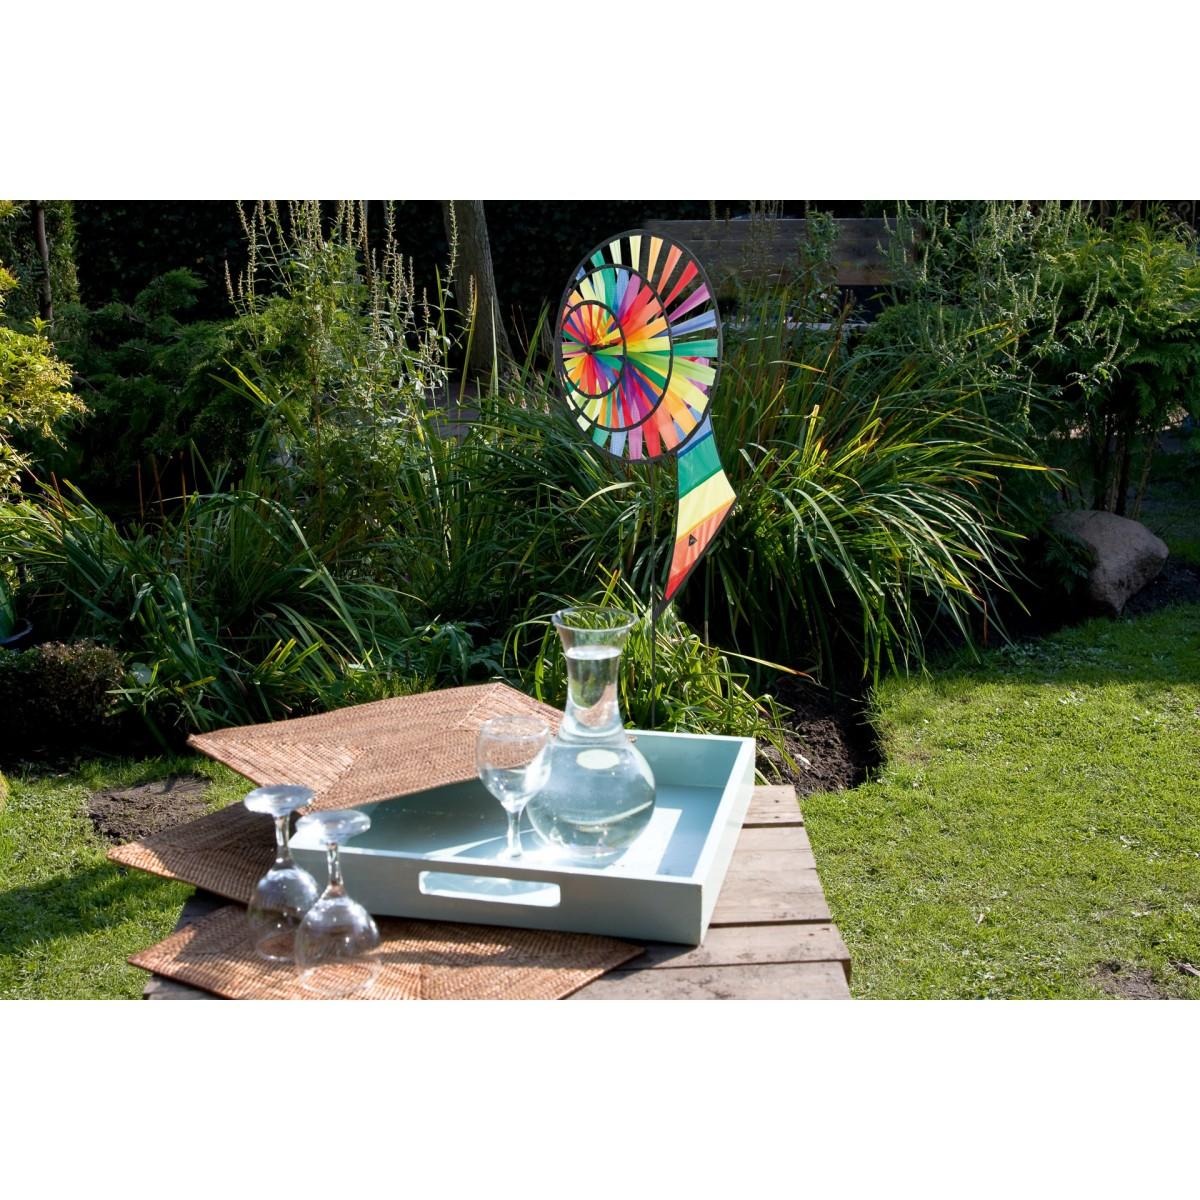 Magic wheel triple banner rainbow hq windspiel garten dekoration - Windsegel garten ...